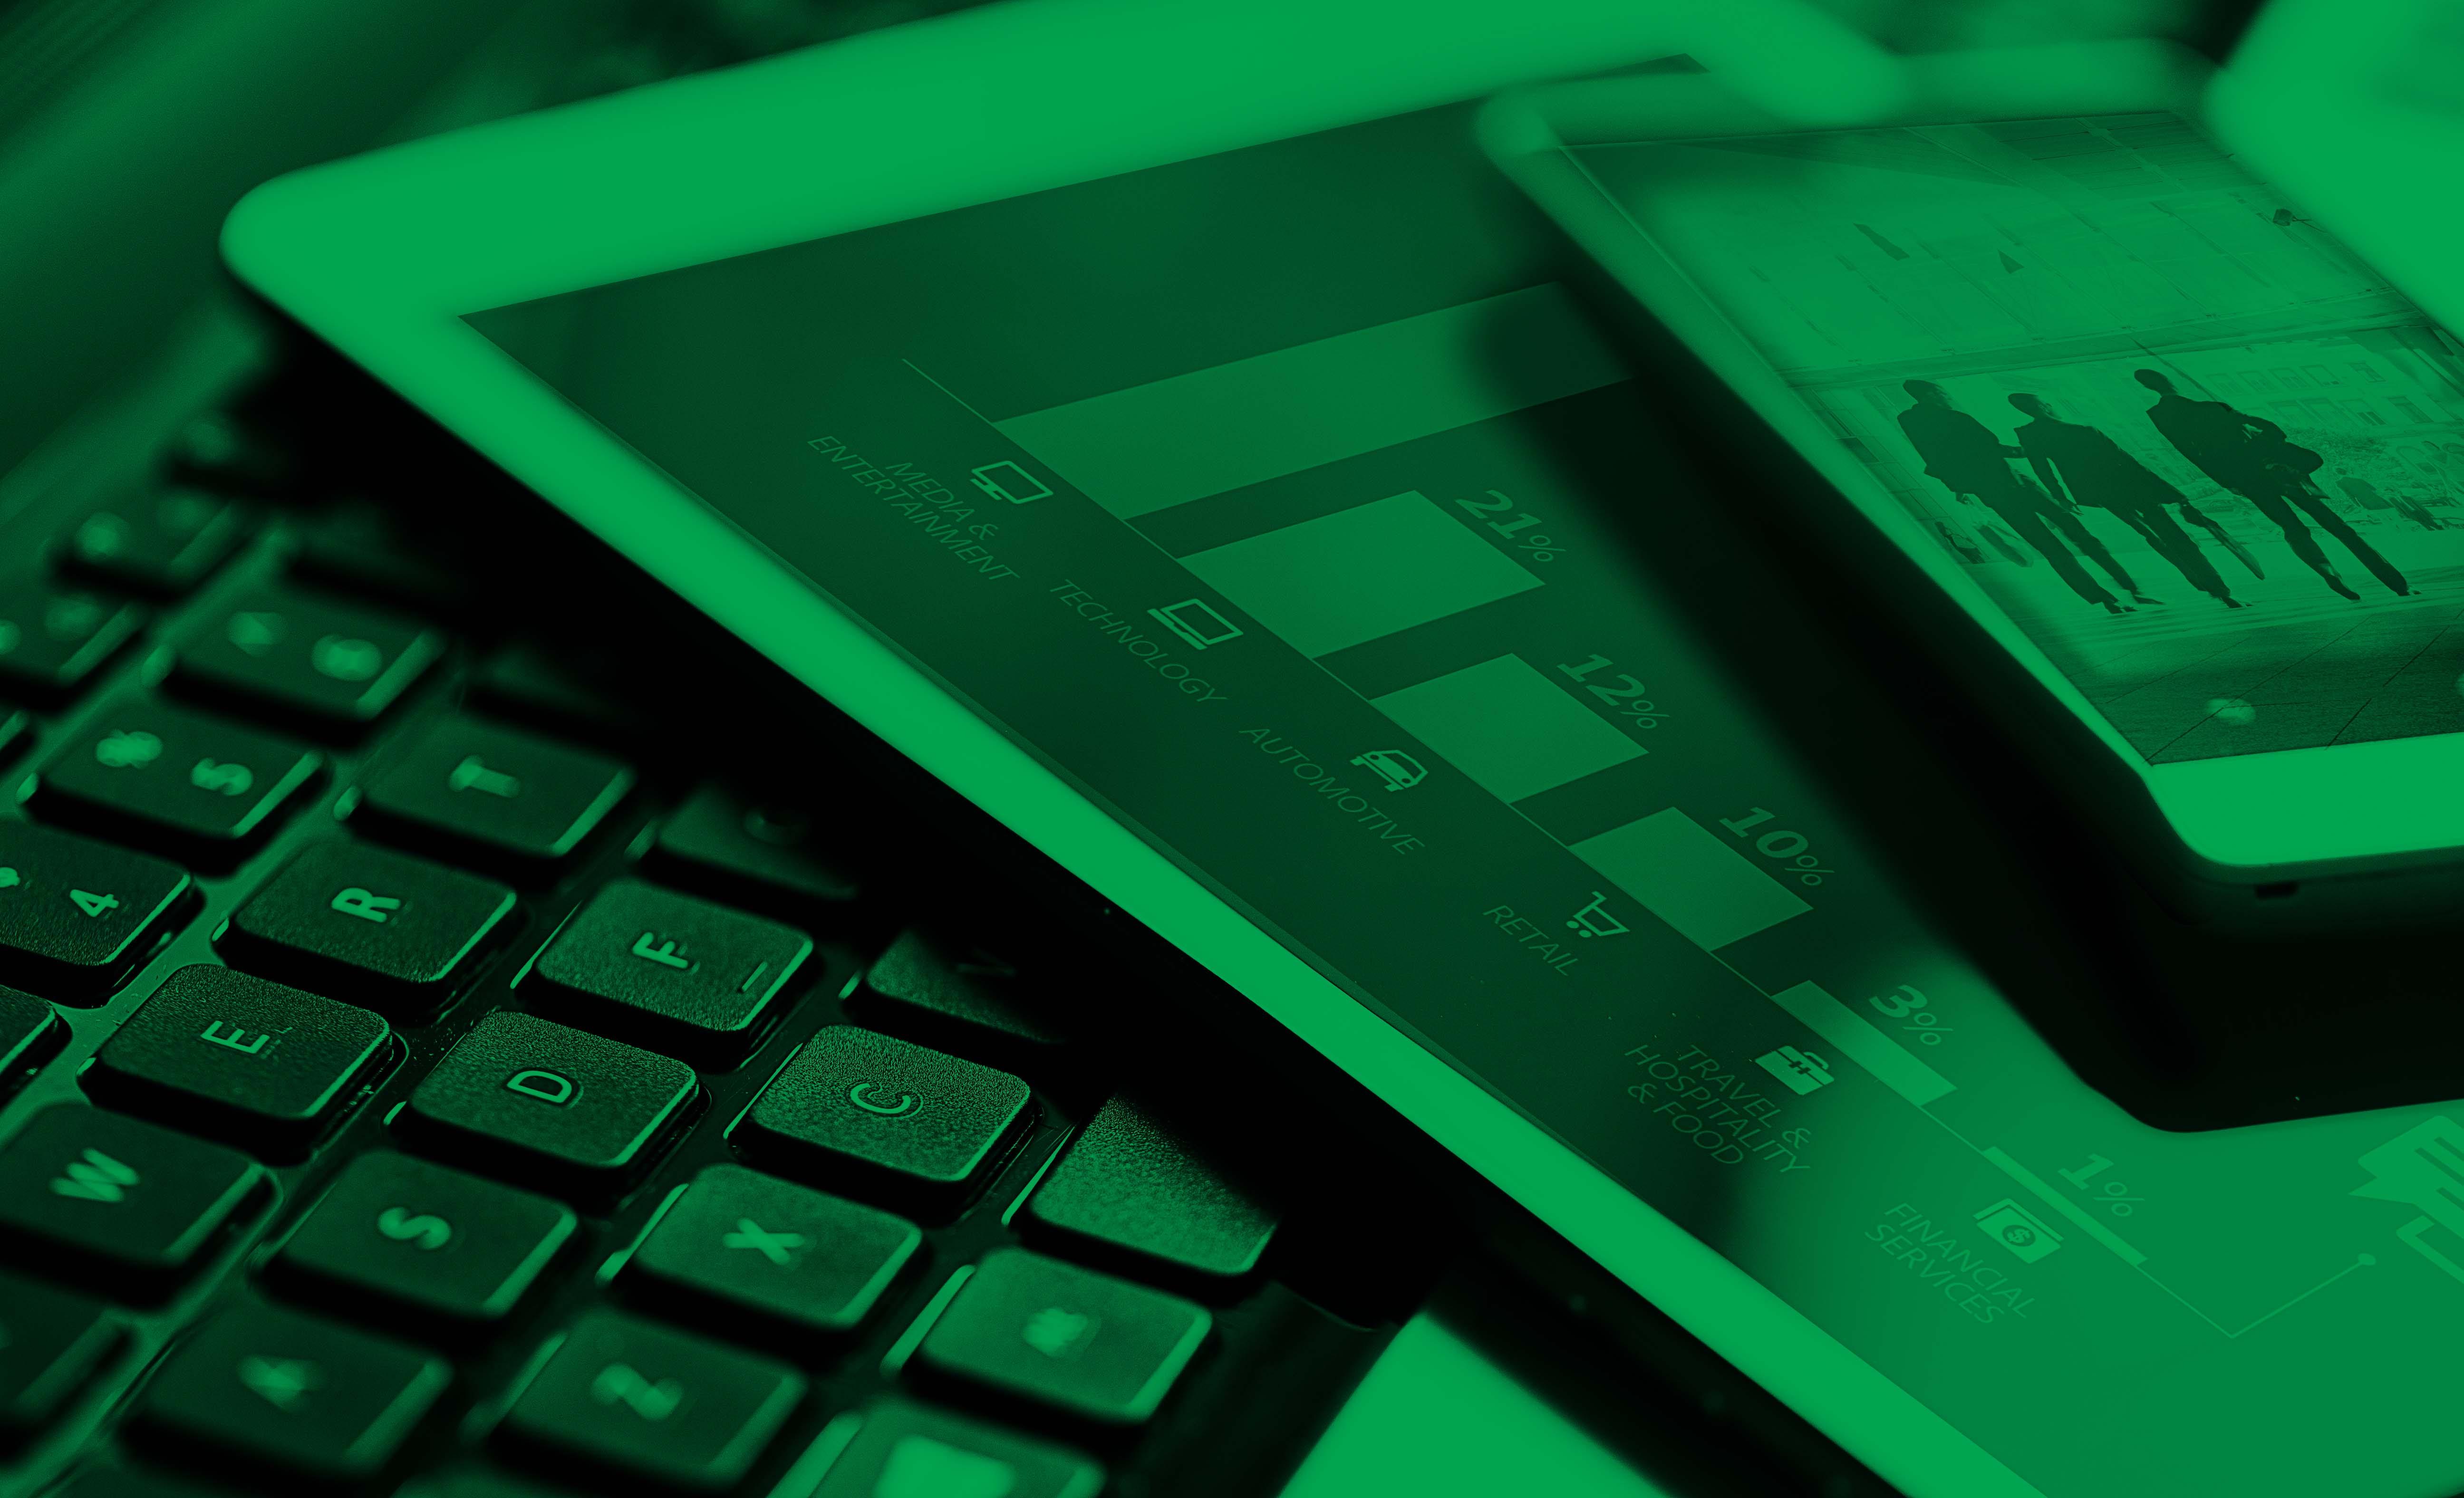 Mobile_Tablet_Keyboard_Screen_Green.jpg